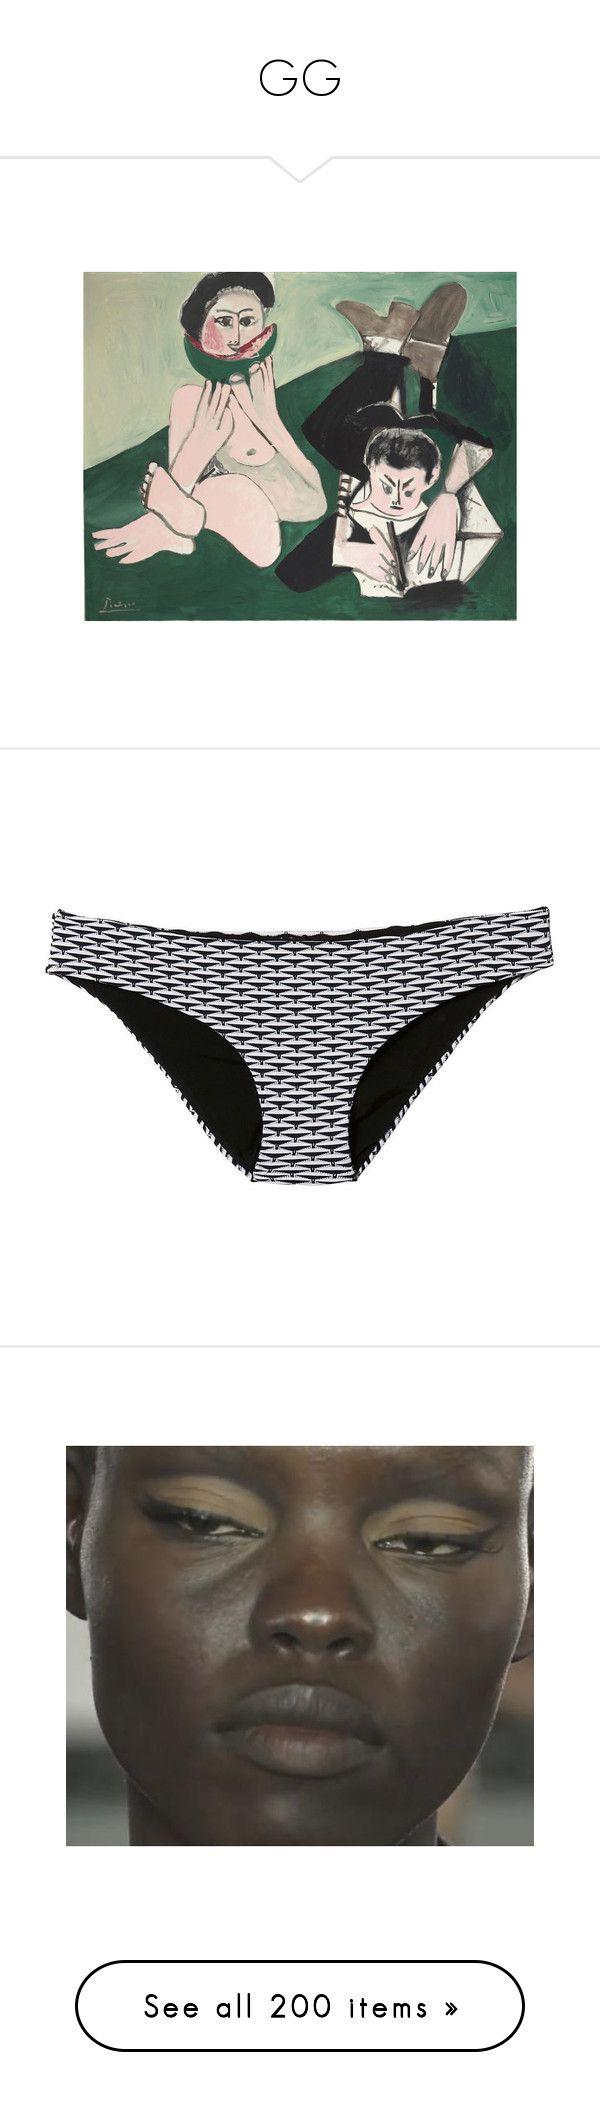 """GG"" by the-lonely-wallflower ❤ liked on Polyvore featuring swimwear, bikinis, bikini bottoms, multi, bikini bottom swimwear, swim bikini bottoms, lily swimwear, nylon swimwear, bottom bikini and shoes"